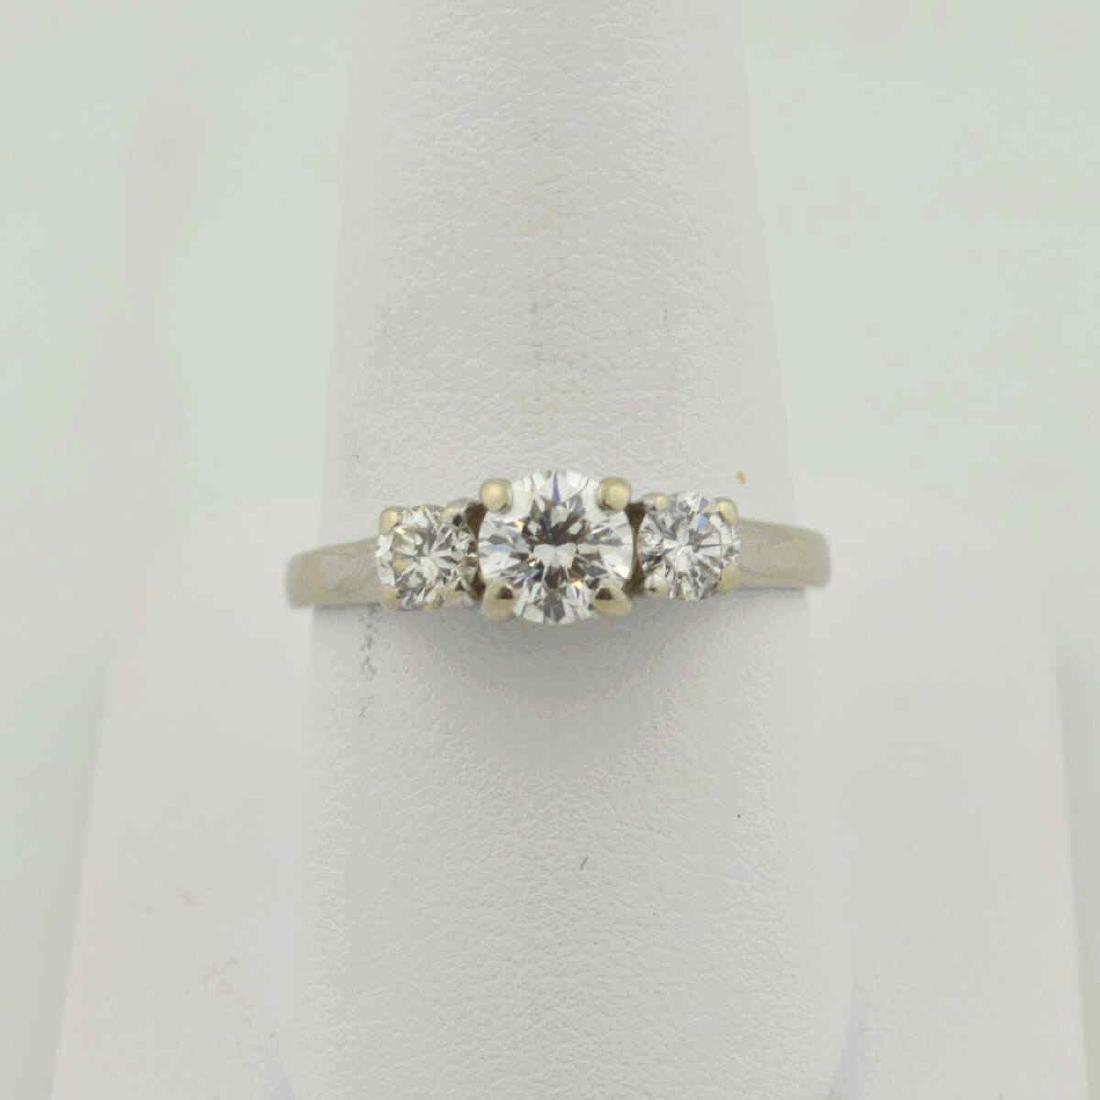 14kt white gold 3 stone diamond ring